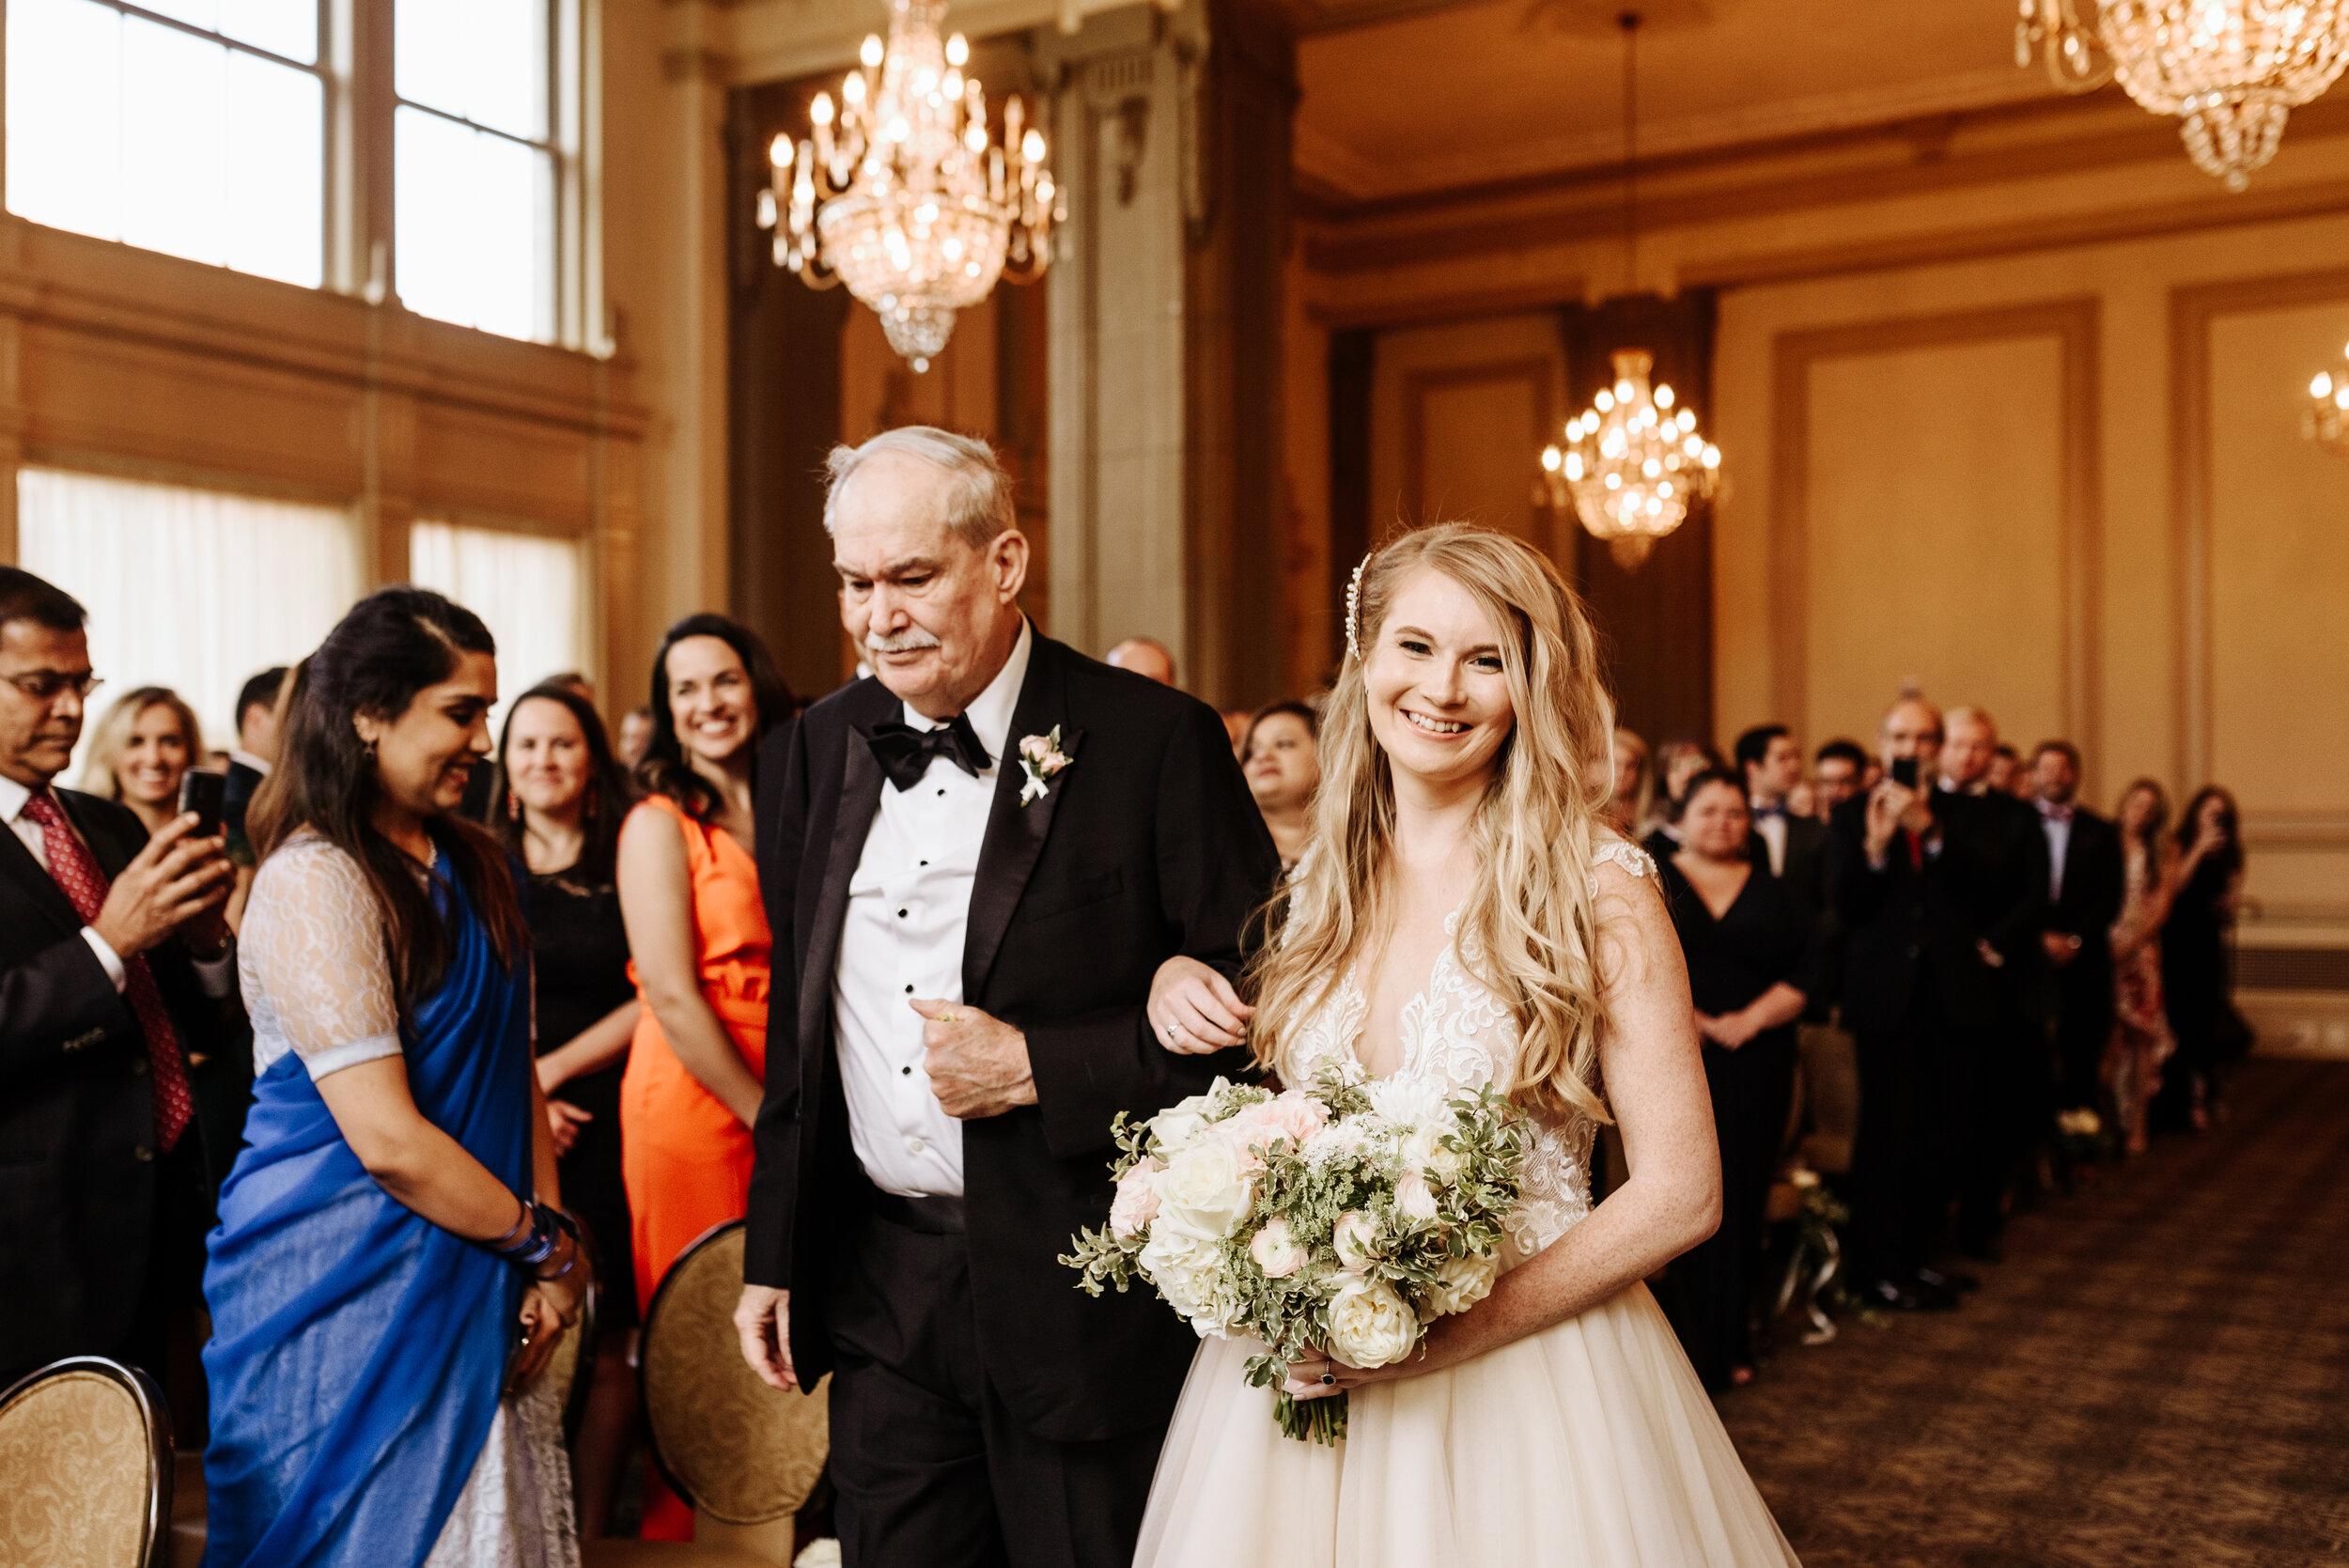 Cassie-Mrunal-Wedding-Quirk-Hotel-John-Marshall-Ballrooms-Richmond-Virginia-Photography-by-V-72.jpg